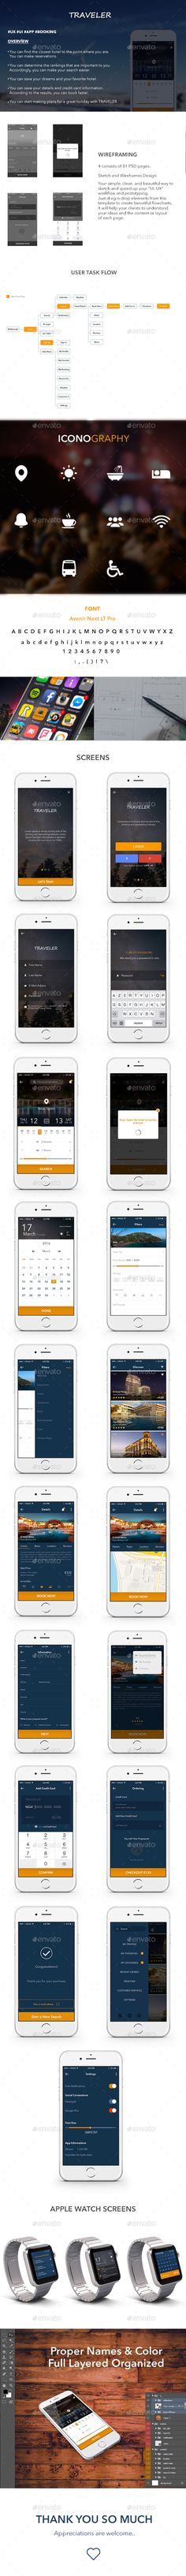 Flat Mobile App UI | Pinterest | Mobile app ui, Mobile app and User ...